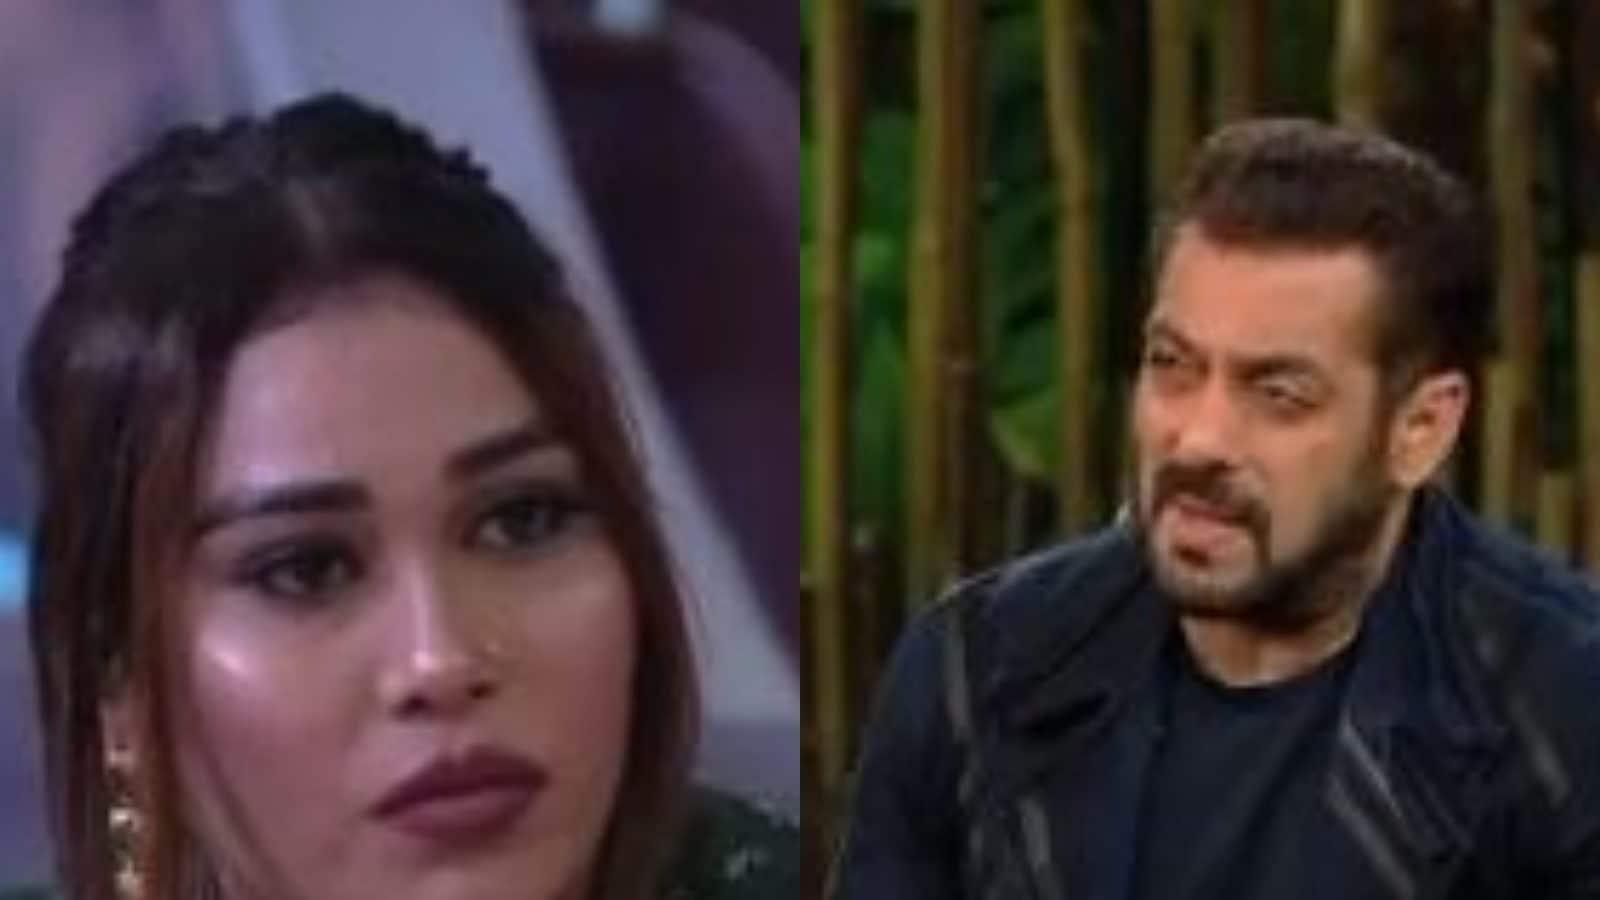 Salman Khan Slams Afsana Khan for Her Foul Language, Ageist Comment Against Shamita Shetty